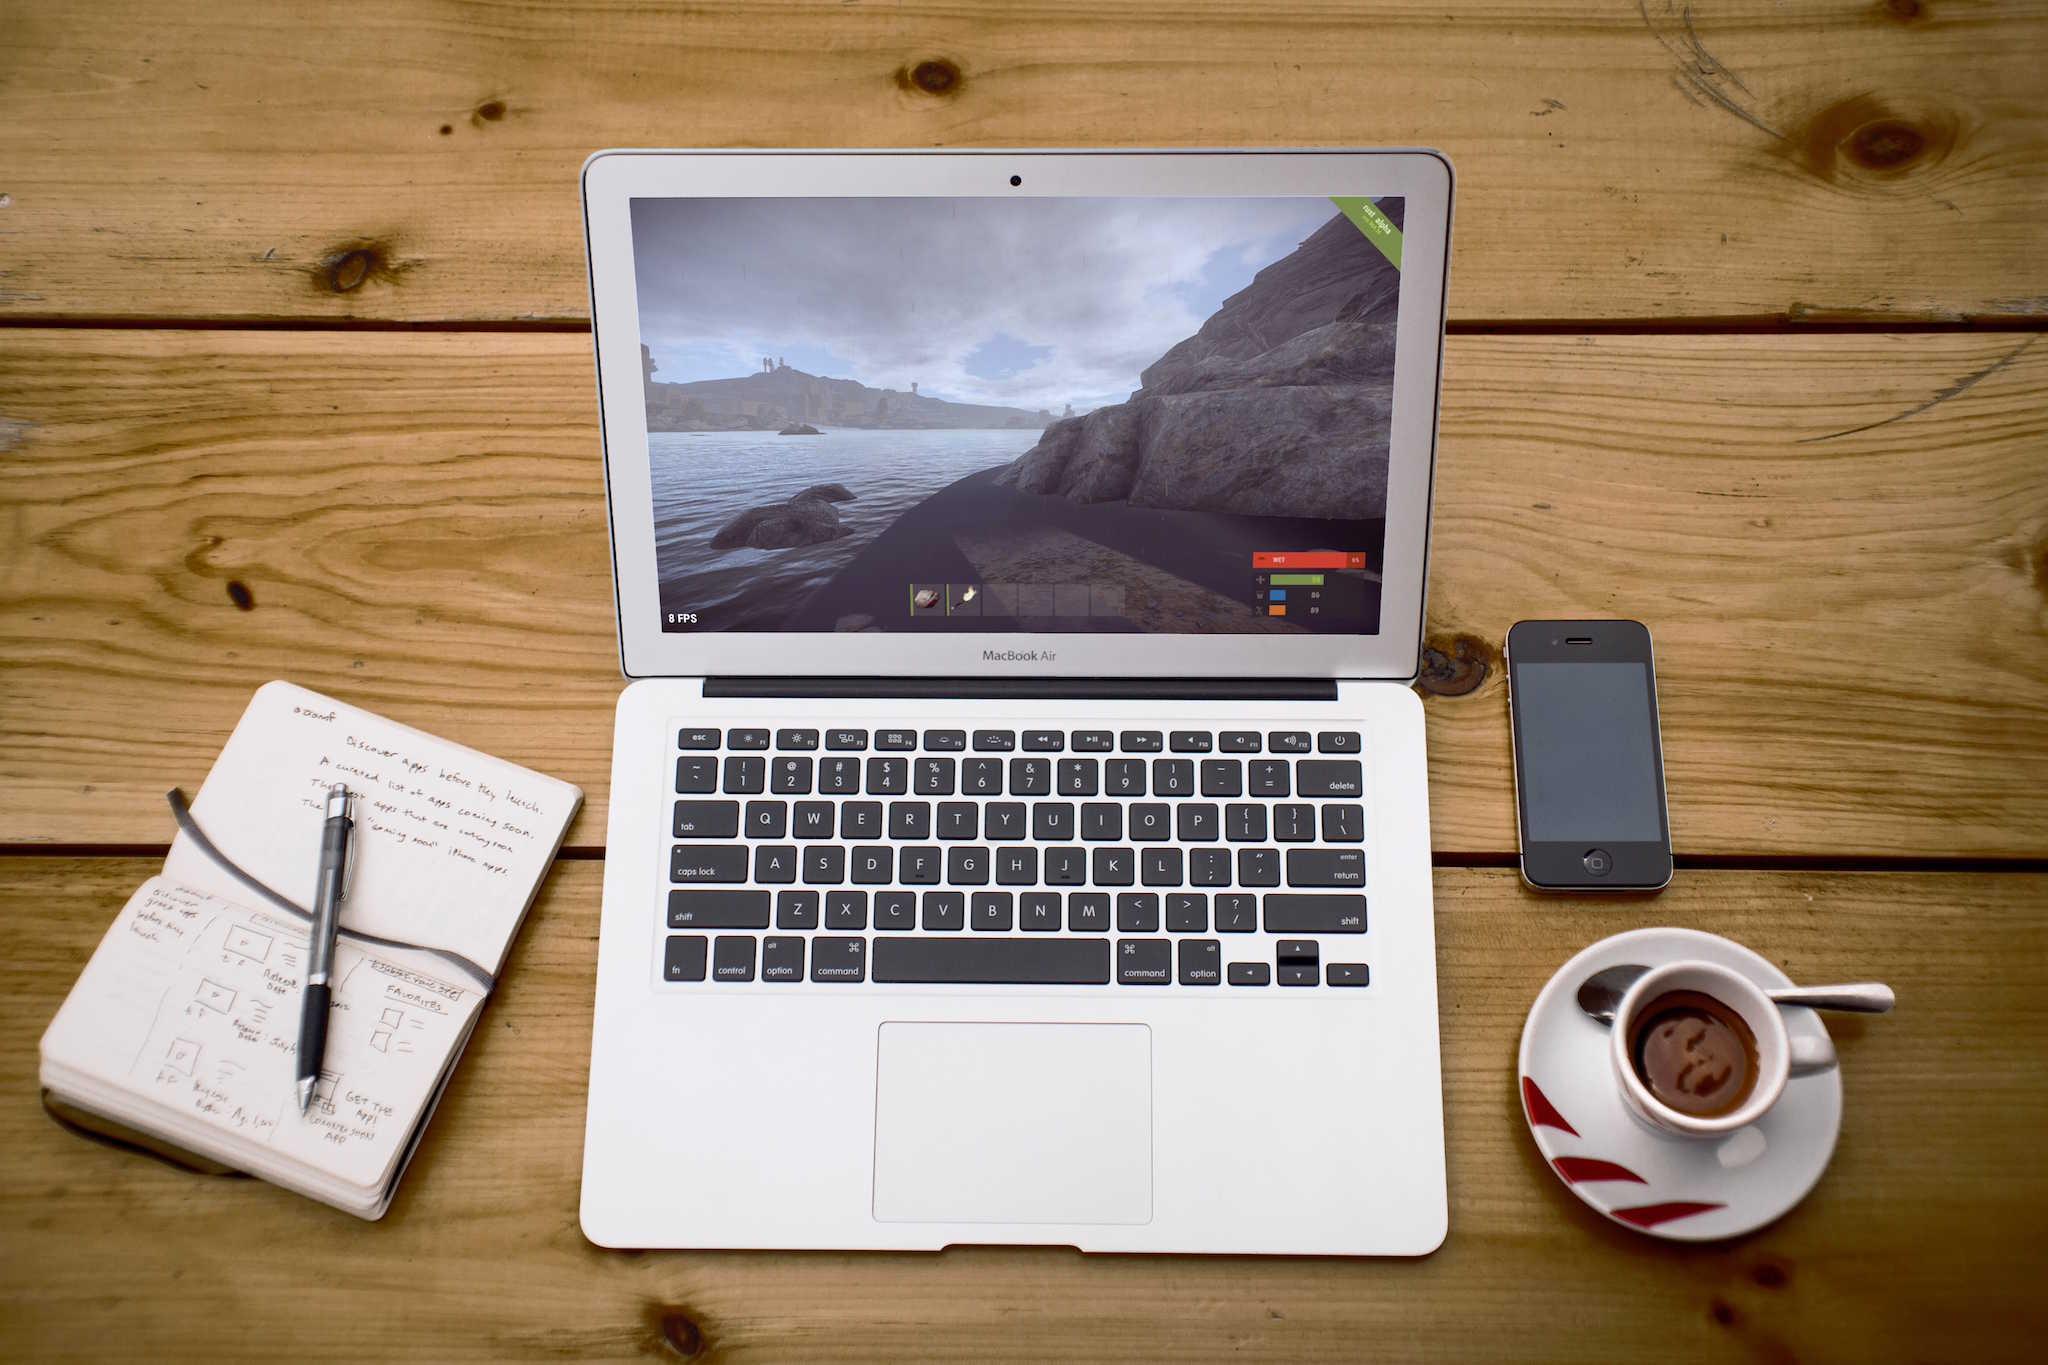 Tweak This Os X Setting To Make Games Run Better Cult Of Mac